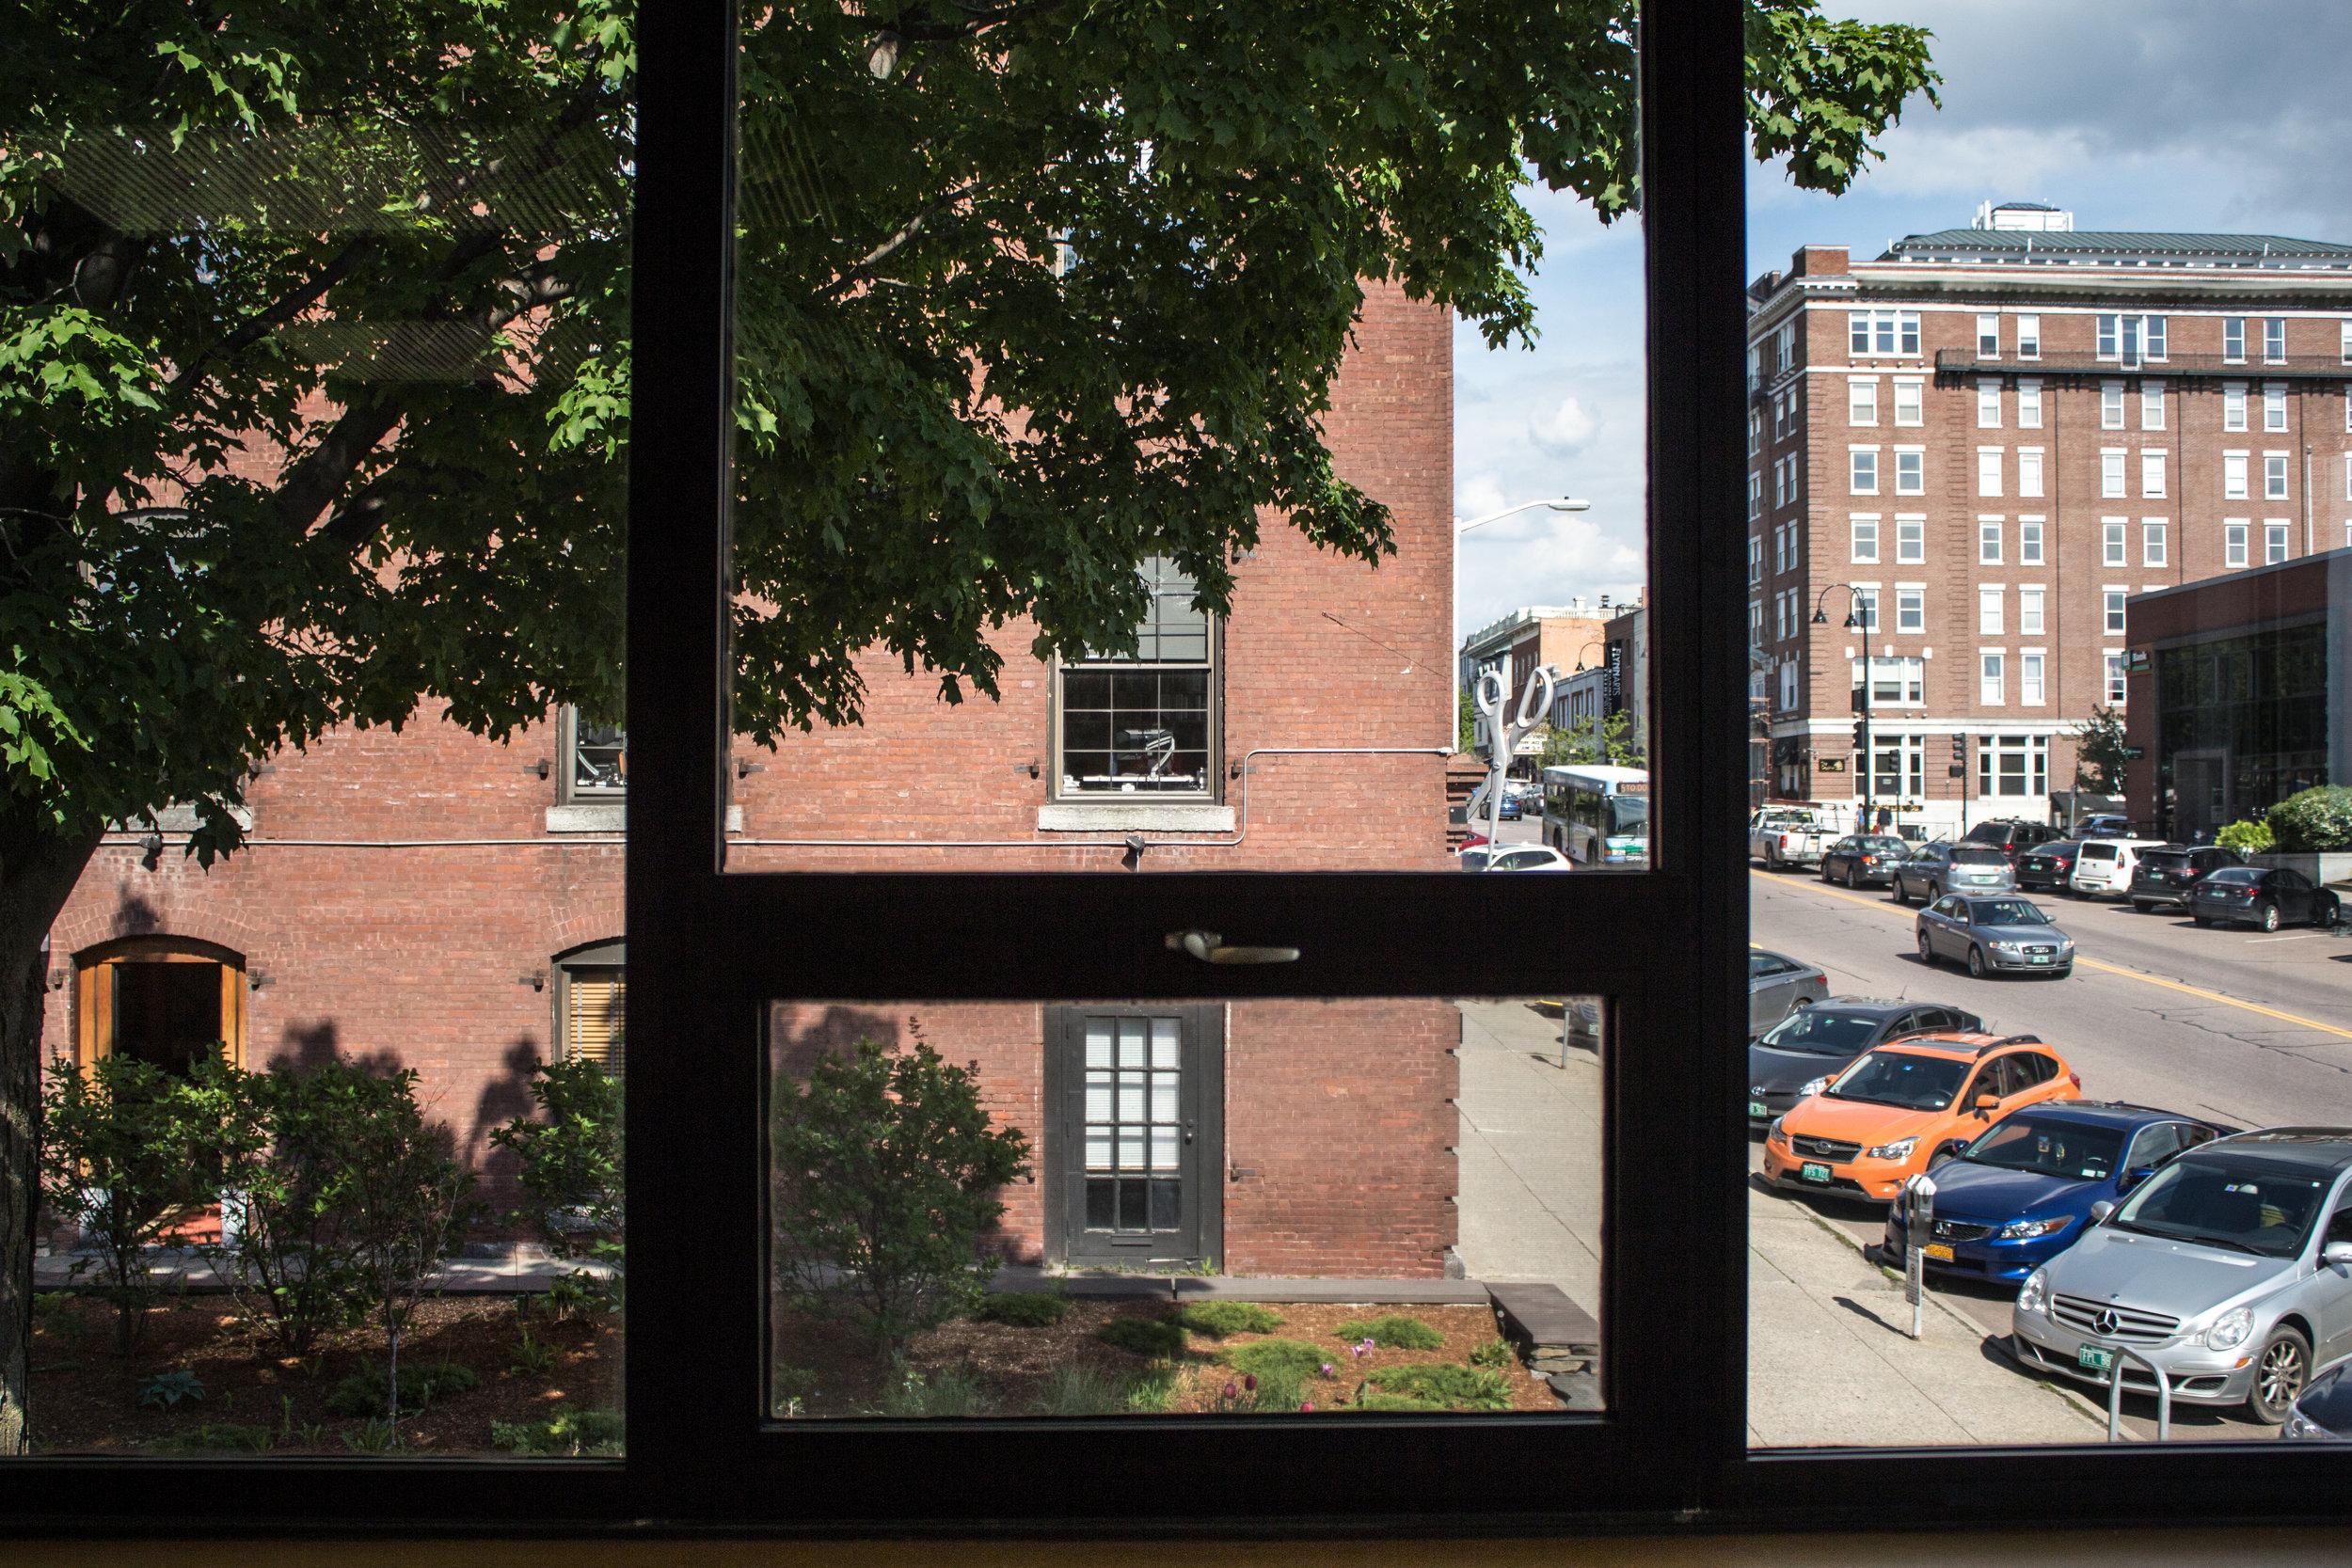 window-shot-2.jpg